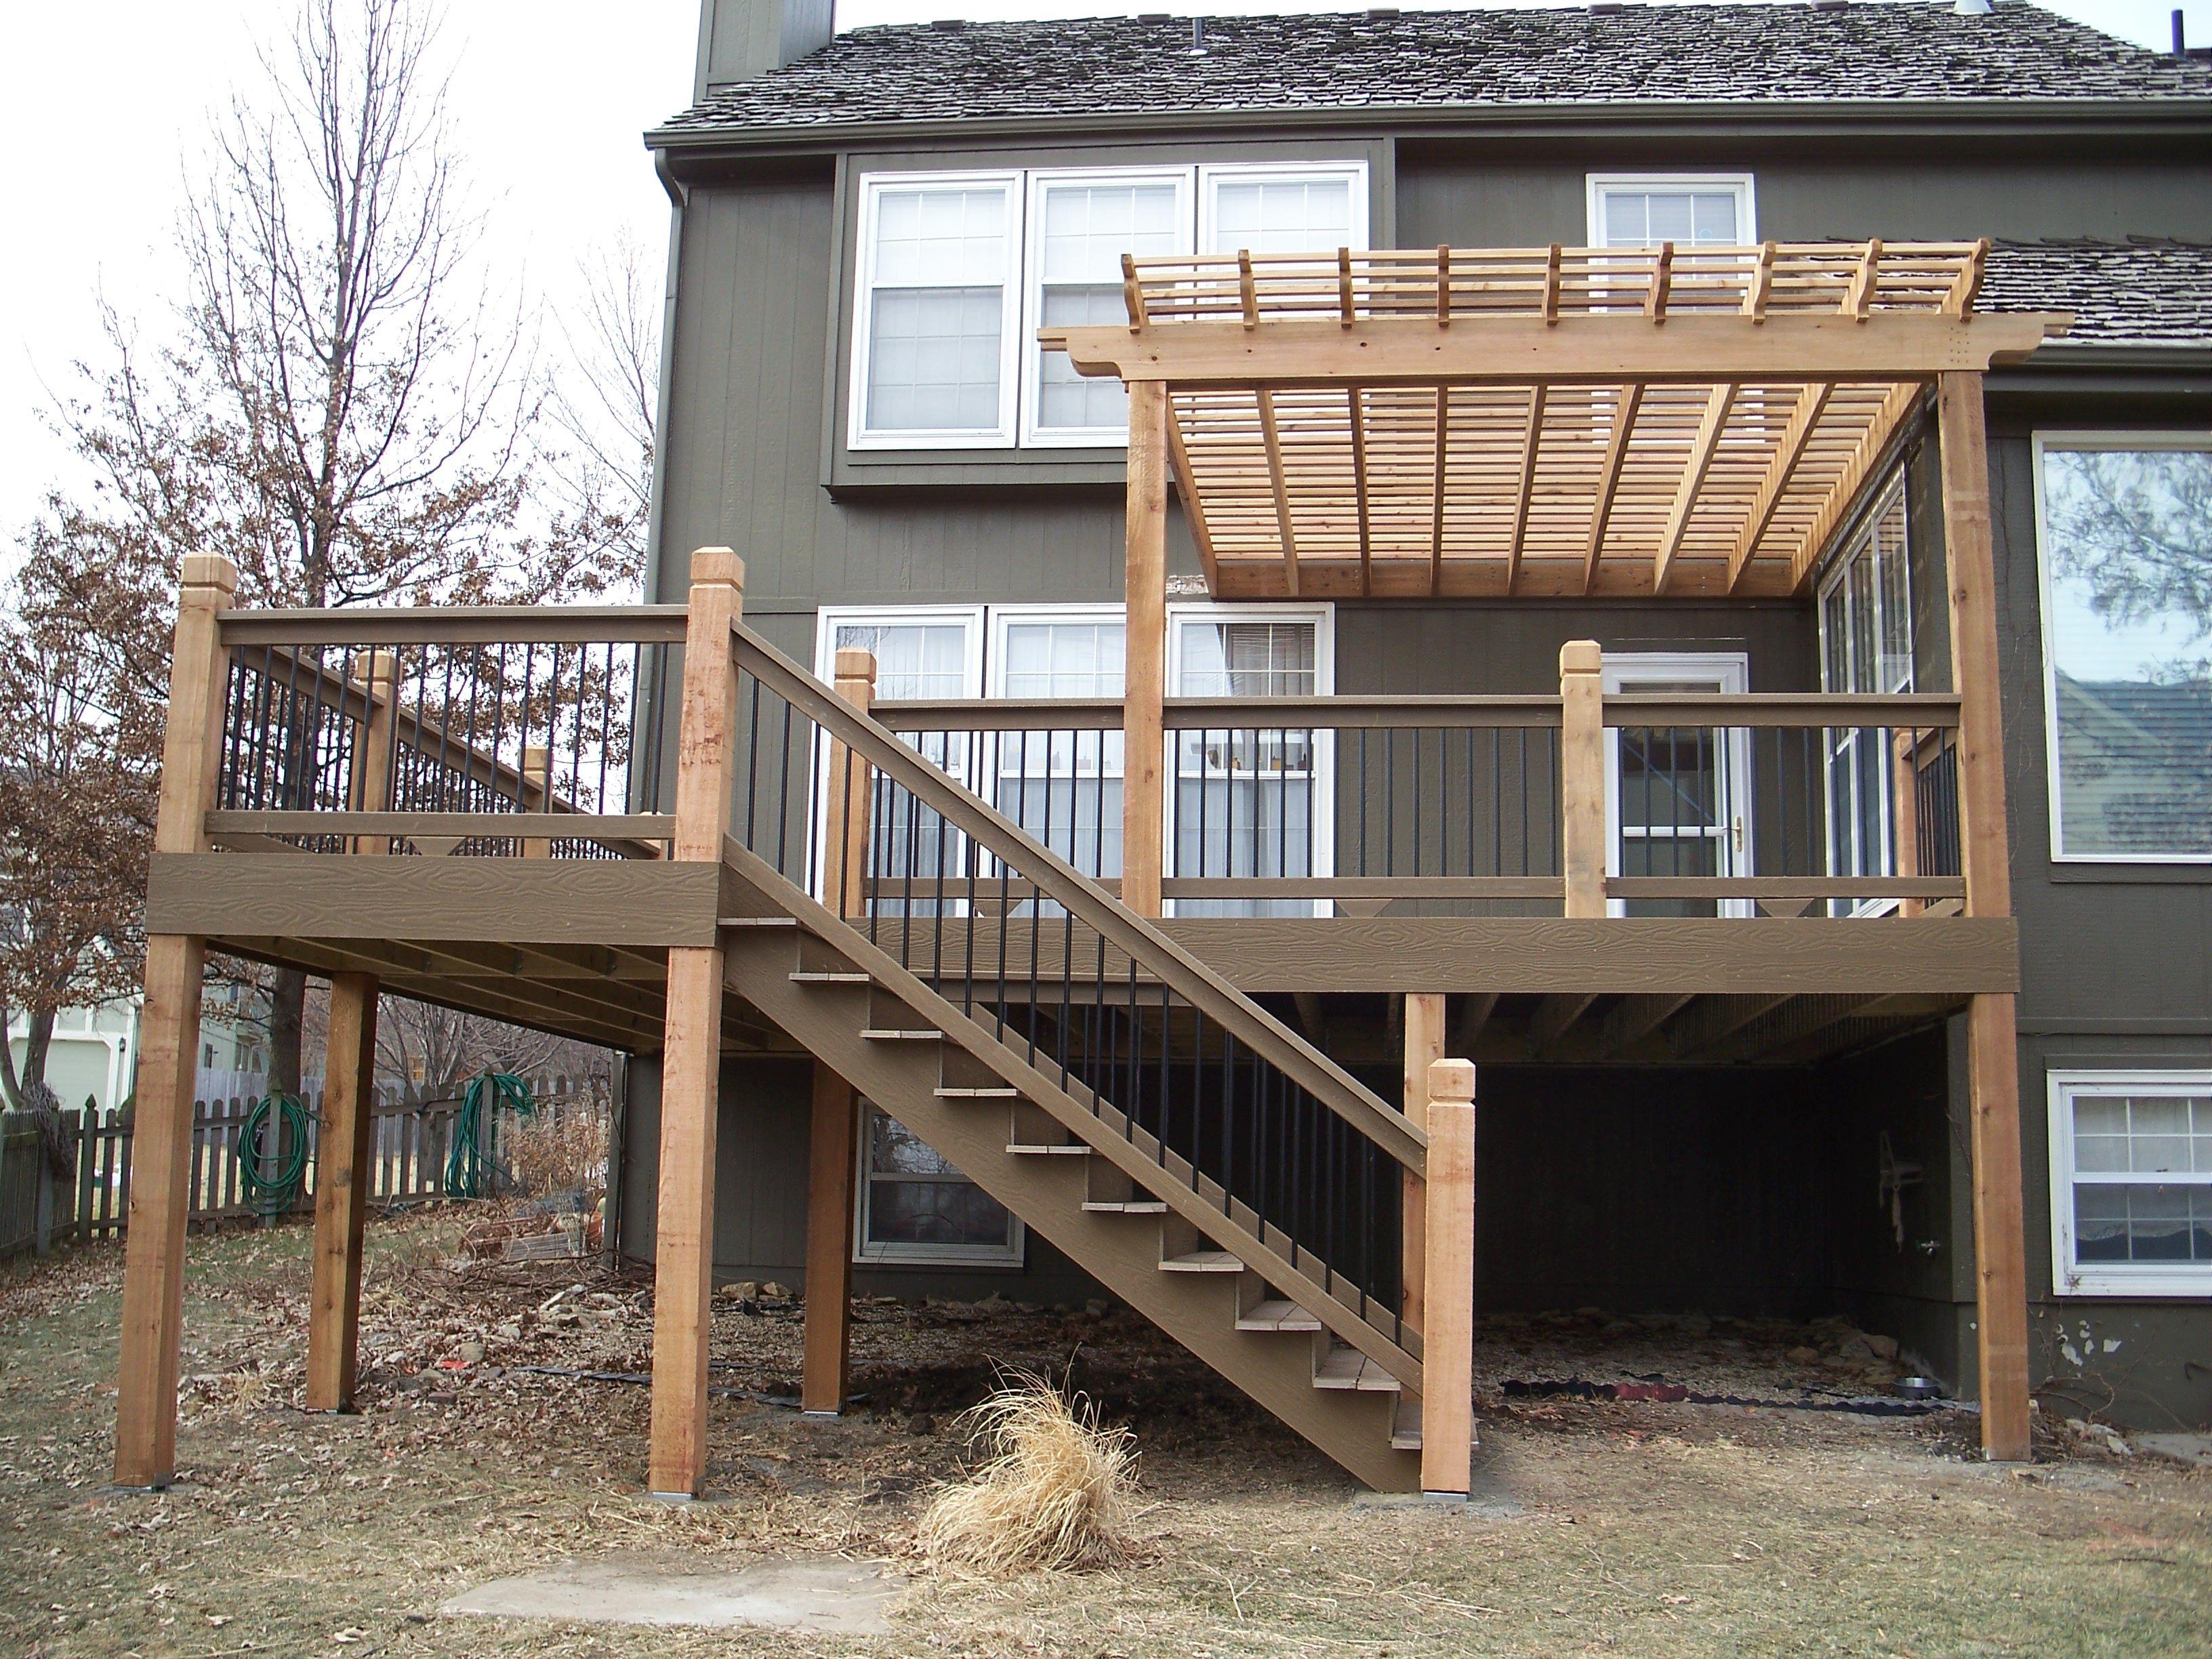 Evergrain Quot Weathered Wood Quot Composite Deck With Cedar Pergola Second Story Deck Pergola Plans Building A Pergola